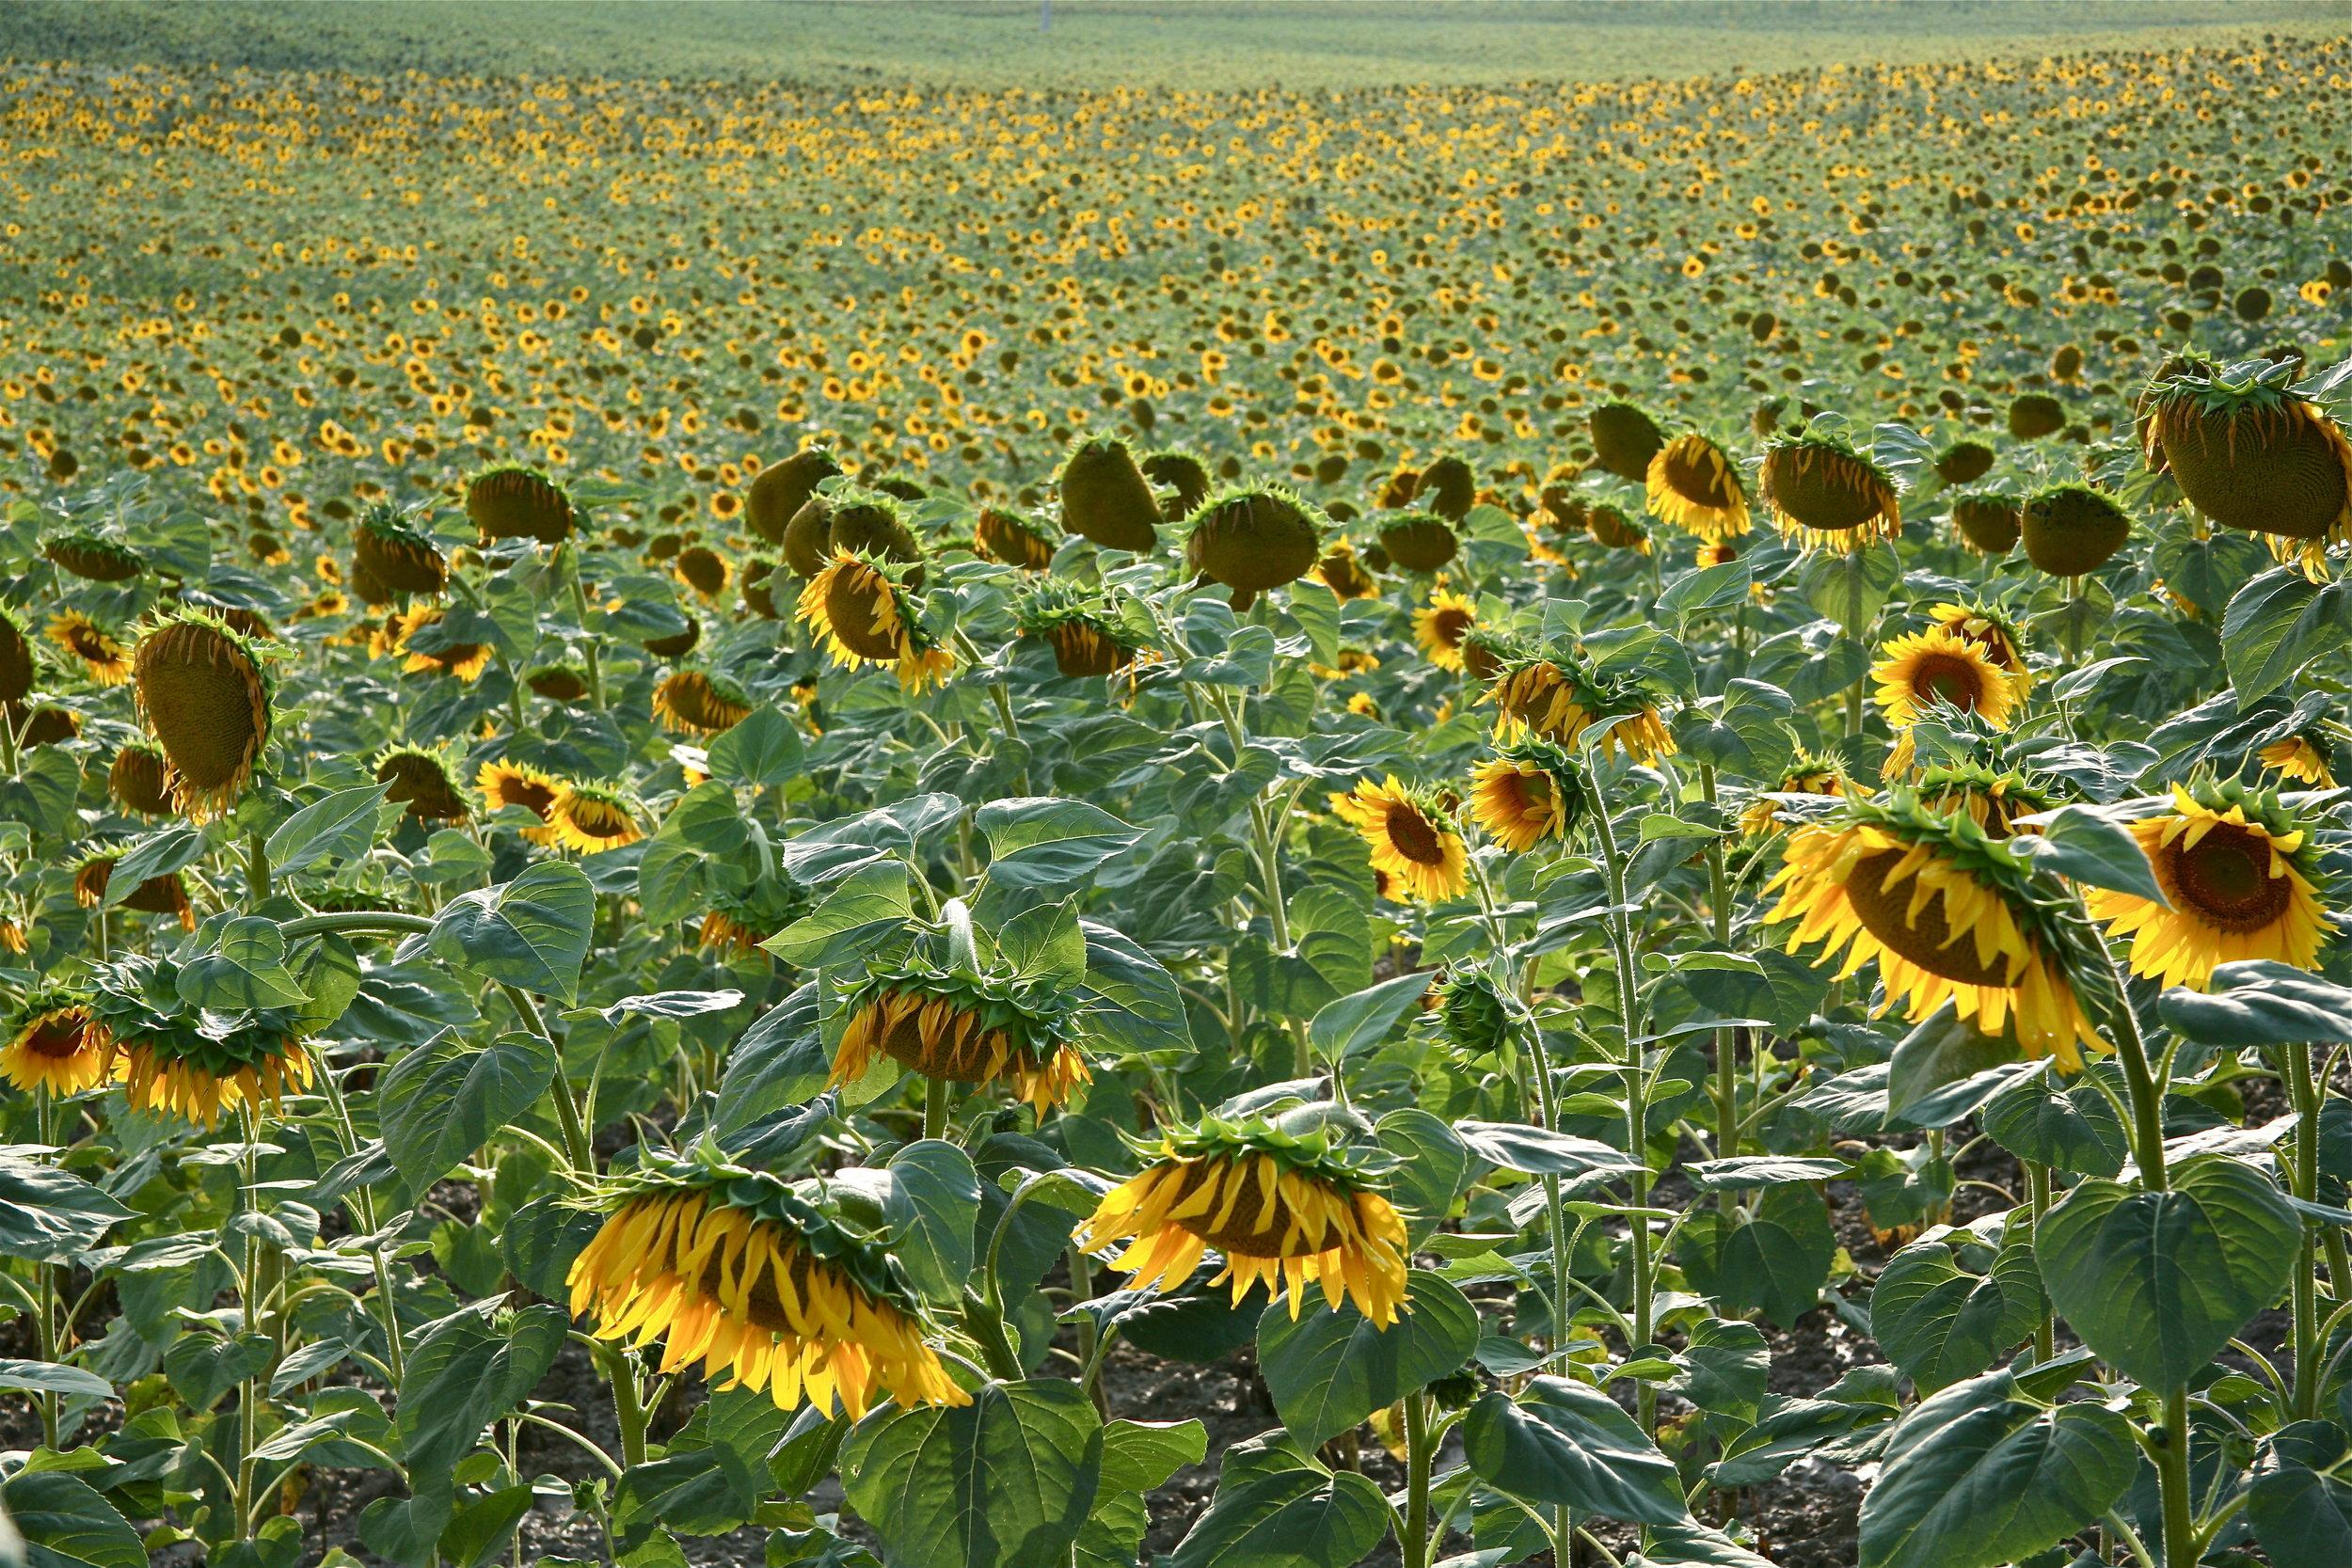 Sunflowers, Siena, Tuscany